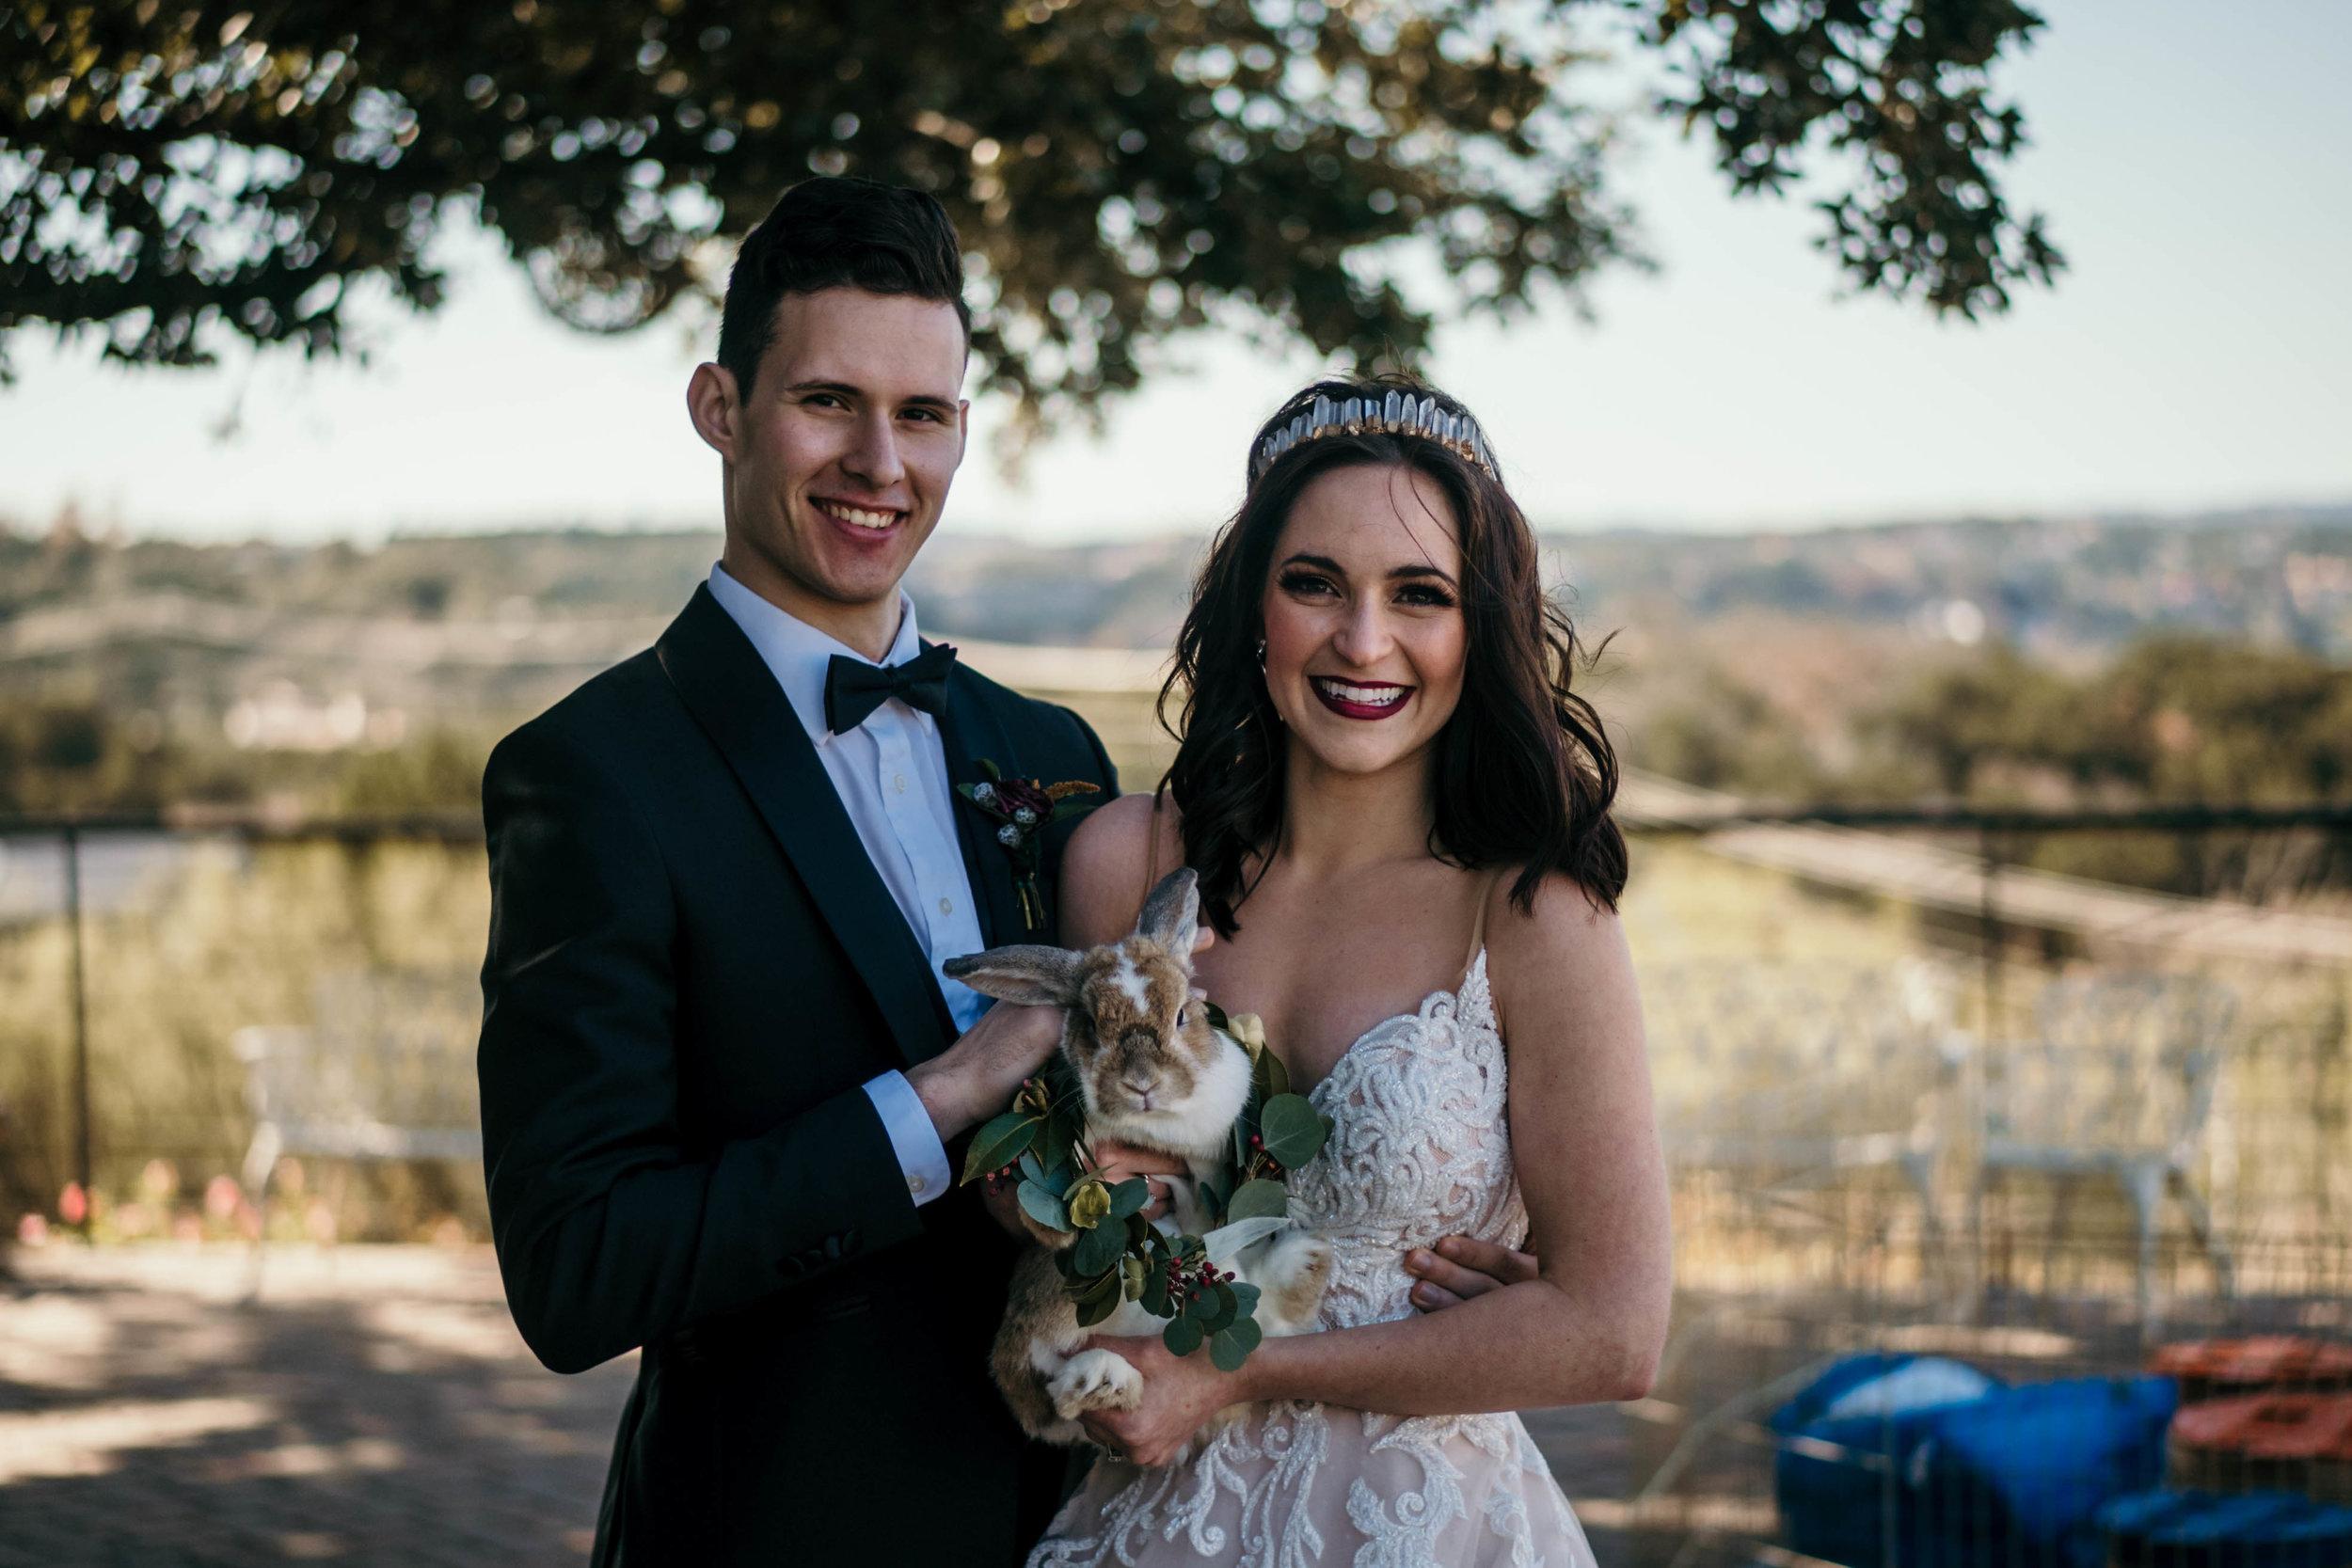 Austin Wedding Videographer - Dolls for Dolls (155 of 323).jpg